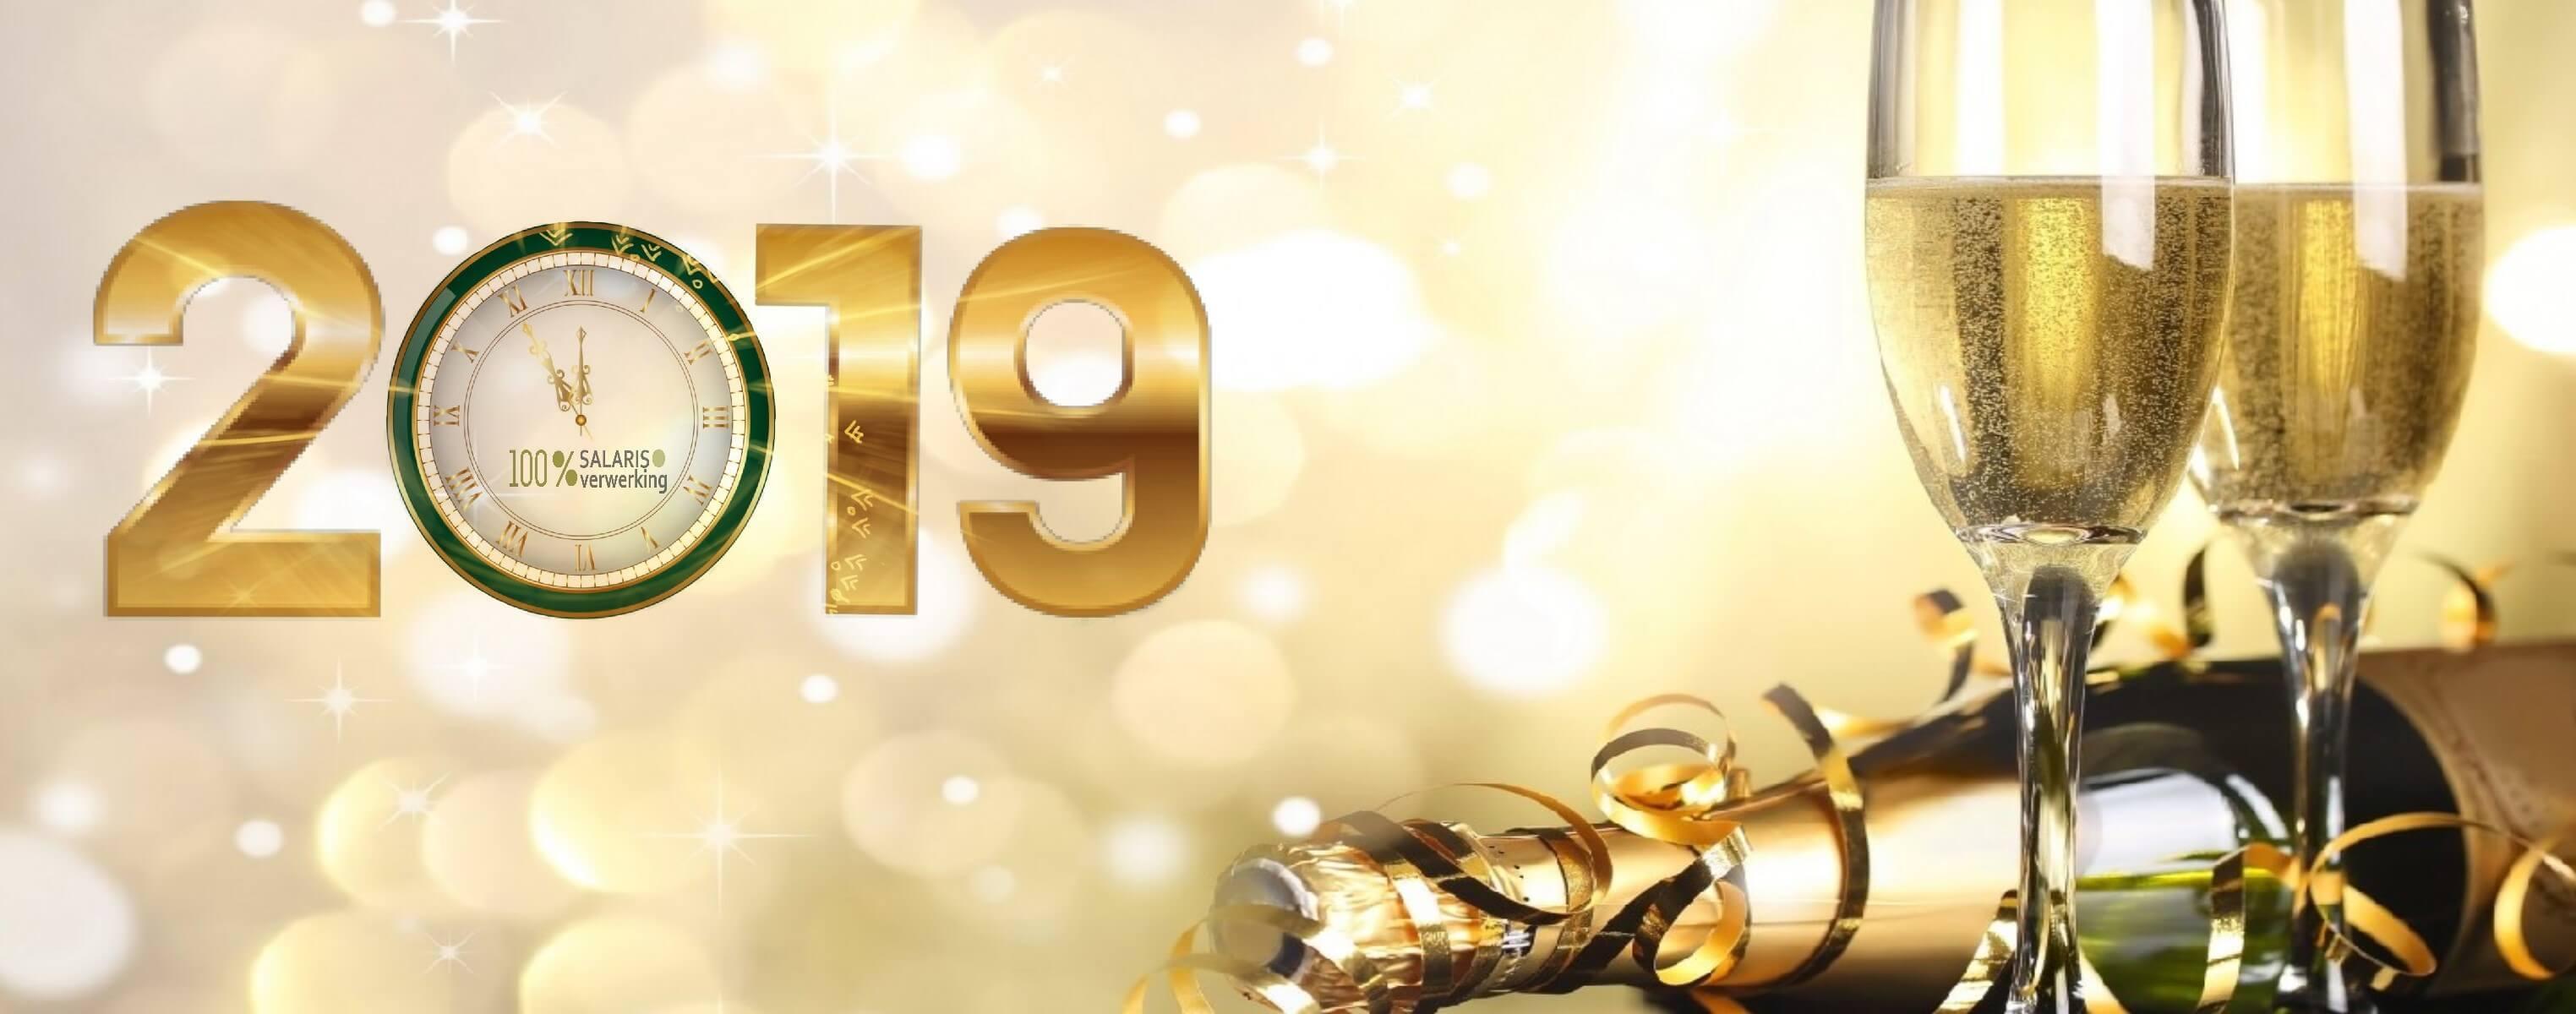 het nieuwe jaar 2019, salarisverwerking, 100% salarisverwerking, 100% werkgeverscoach, 100% payrolling,